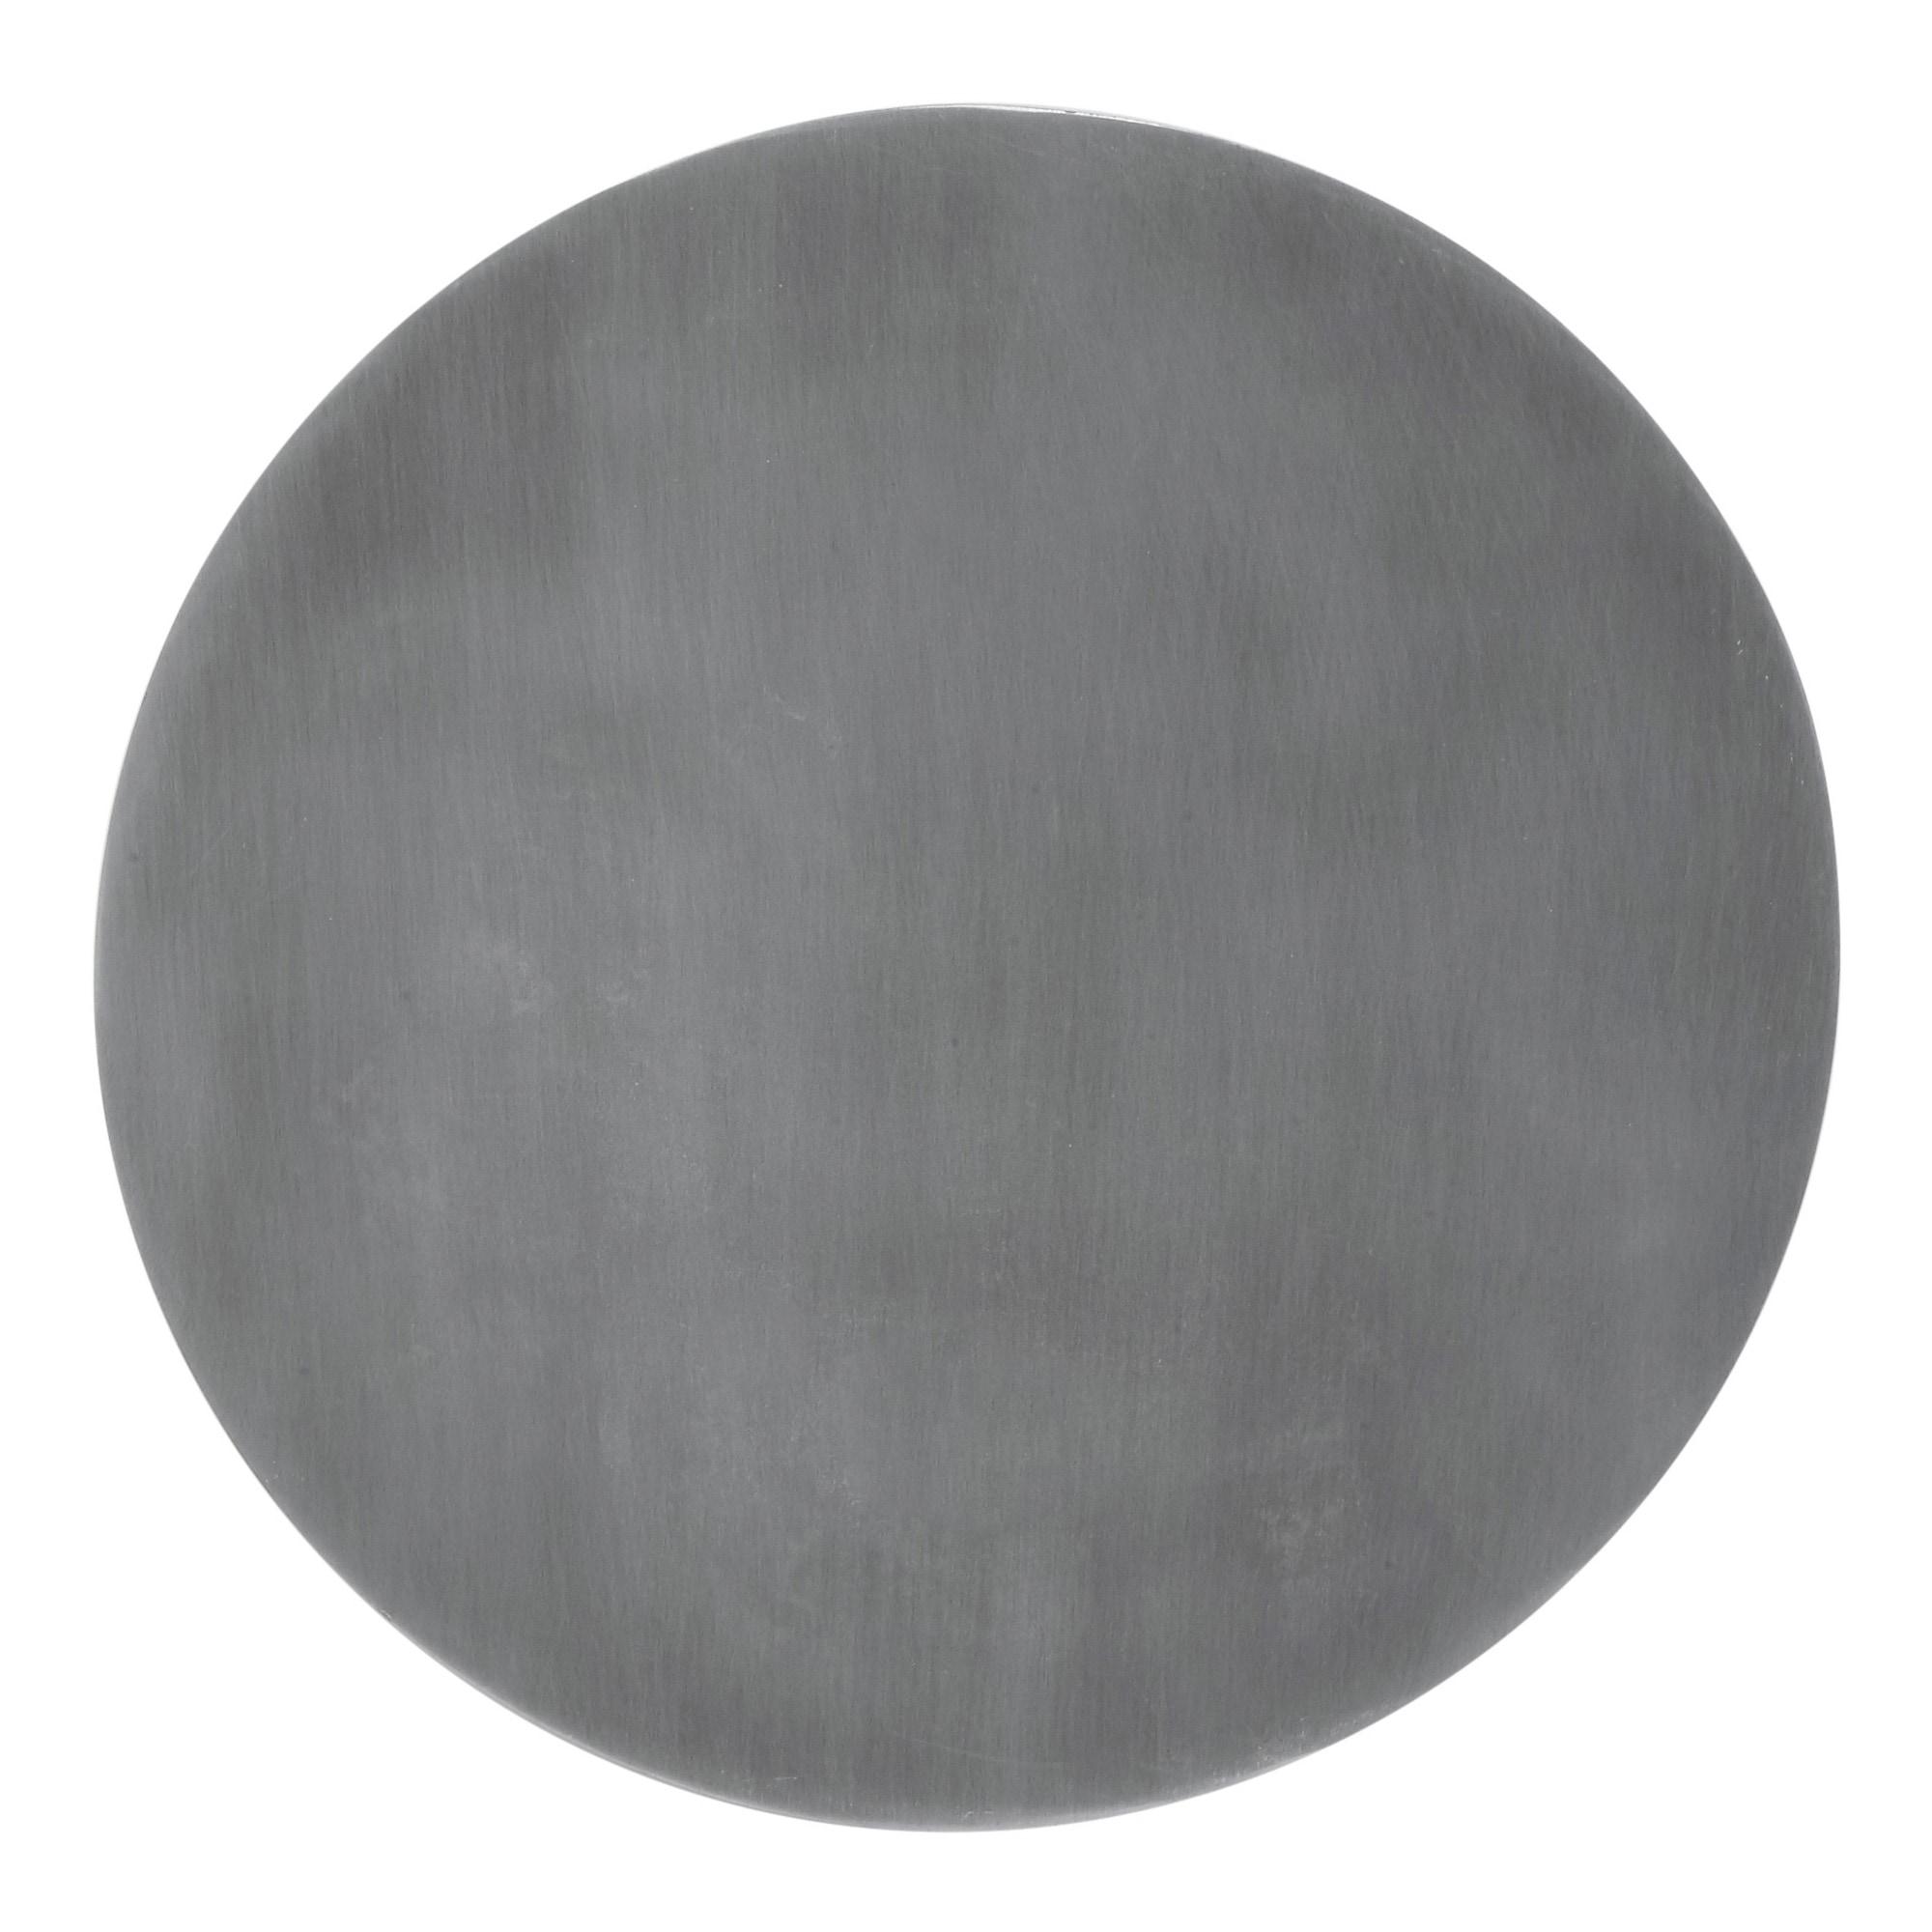 Fullmoon Ø35 vägglampa pale silver